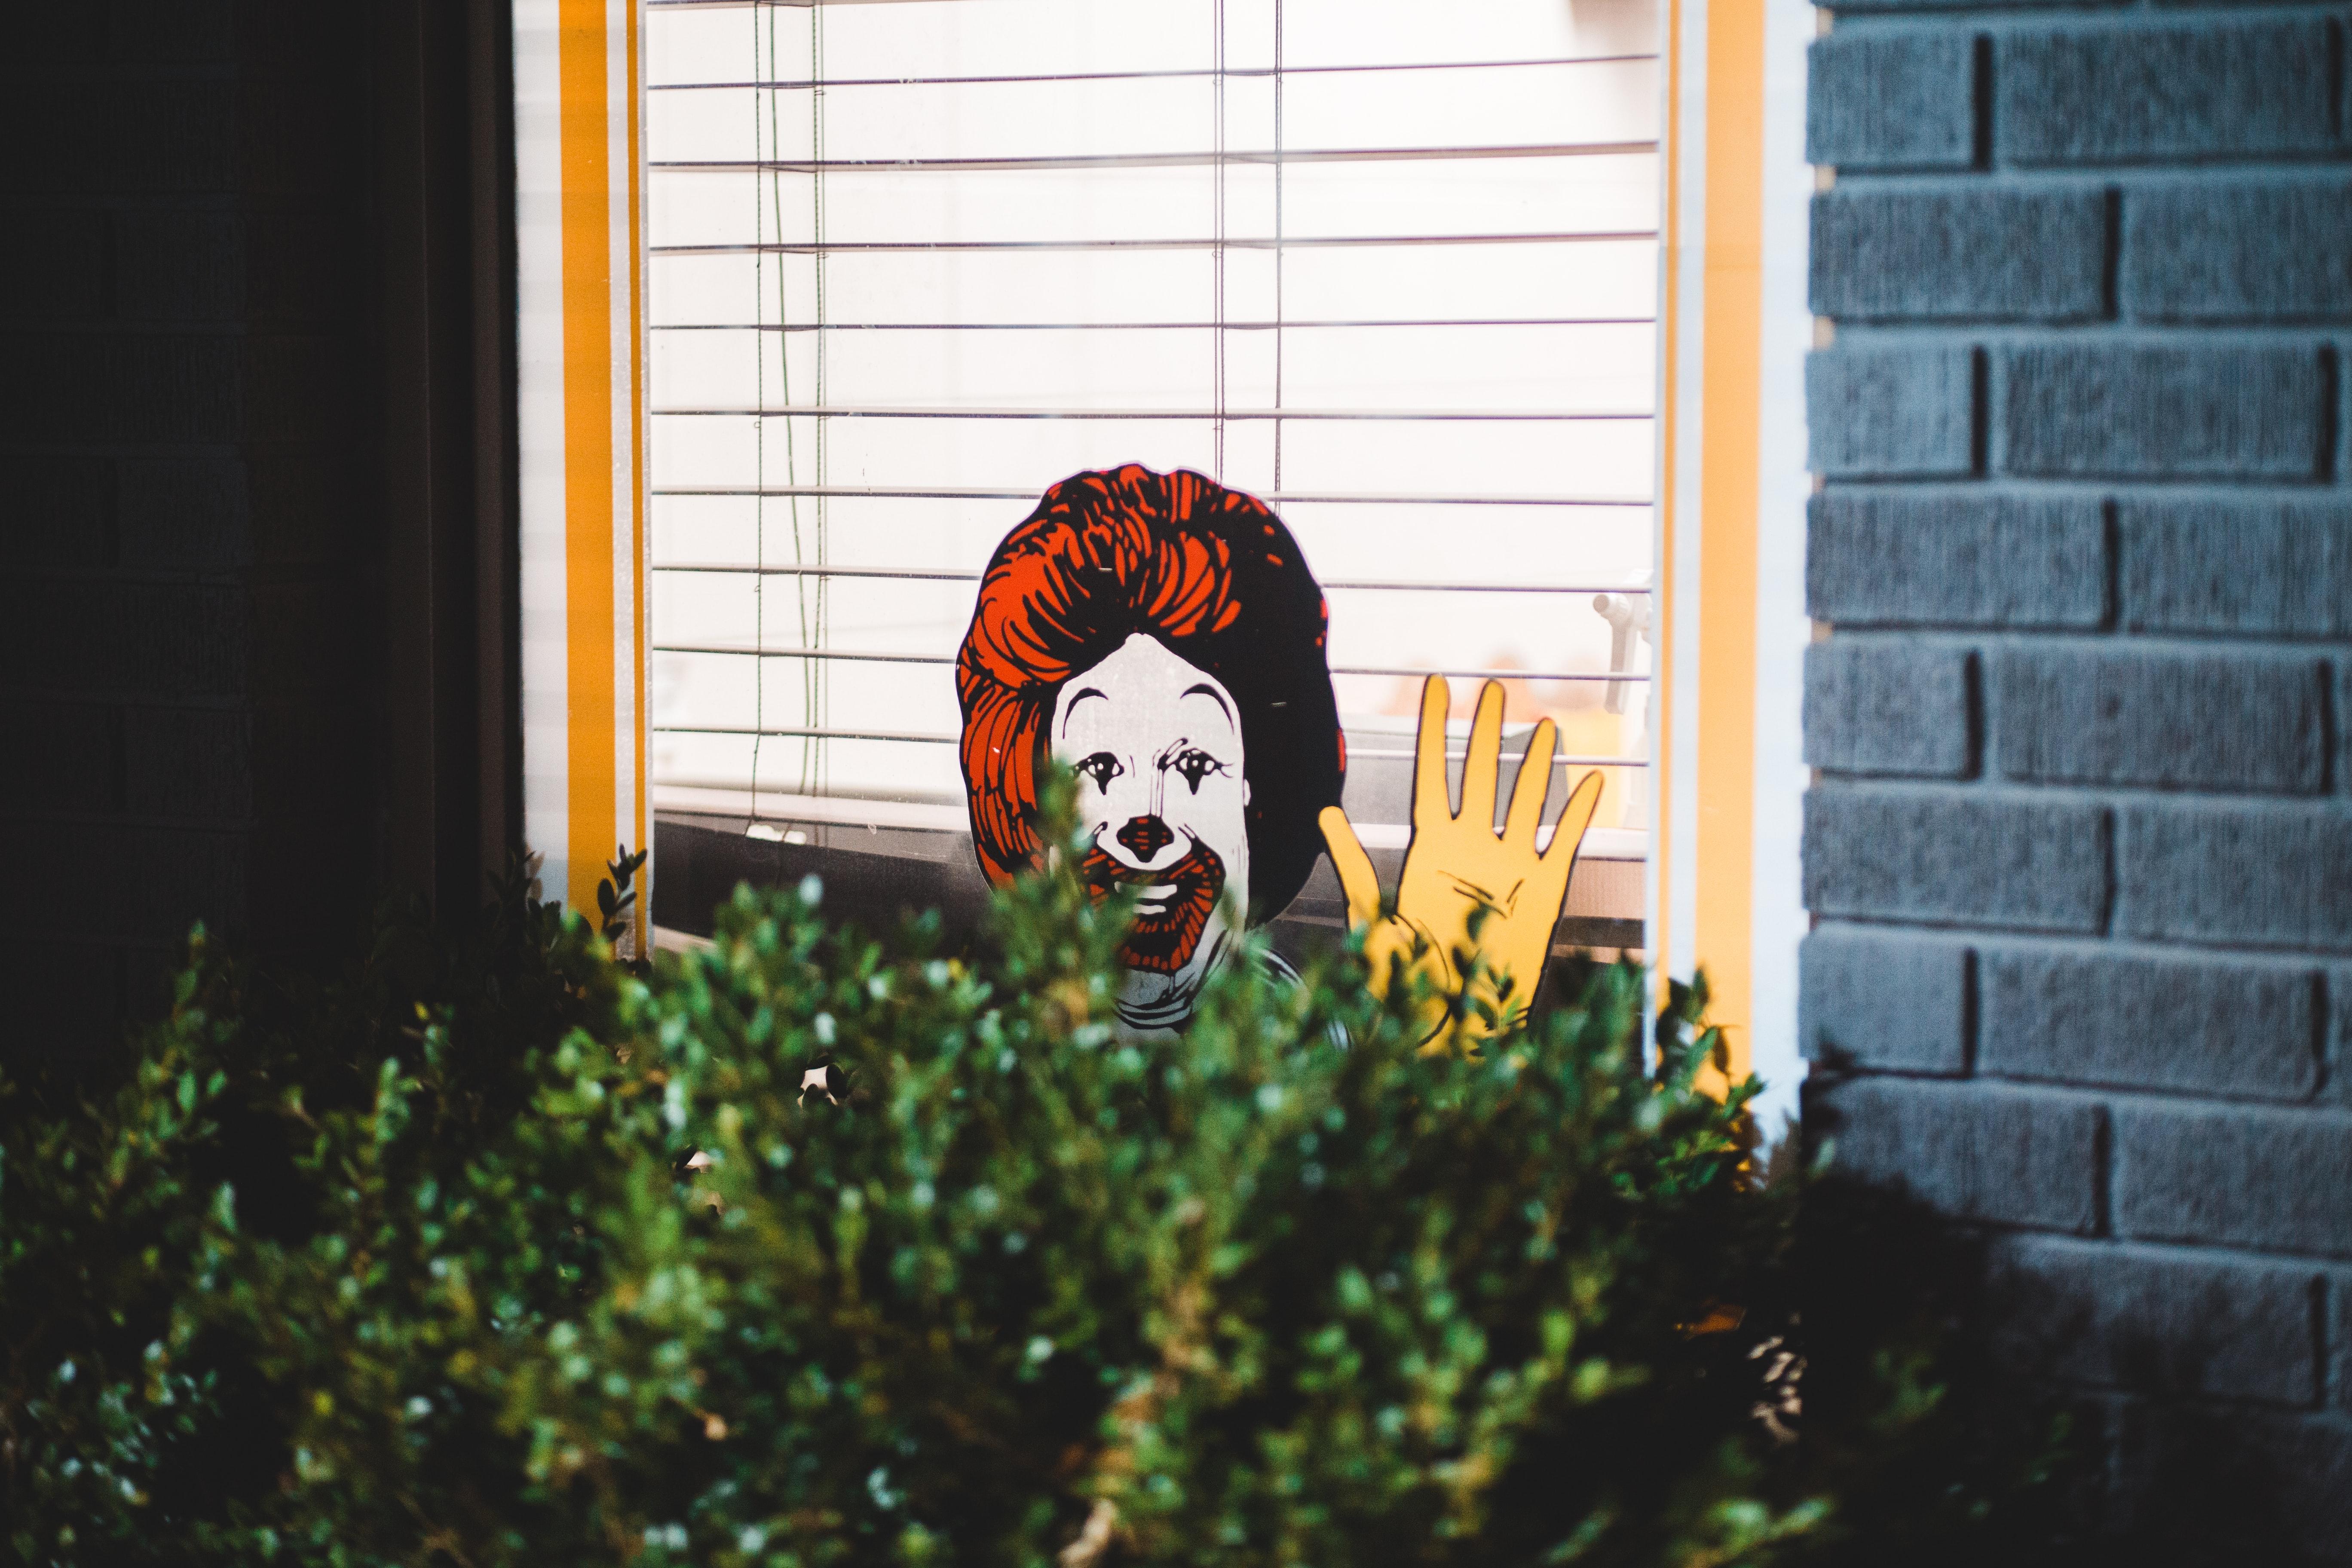 Tinfoil Digest: The McDonald's Ice Cream Machine Edition